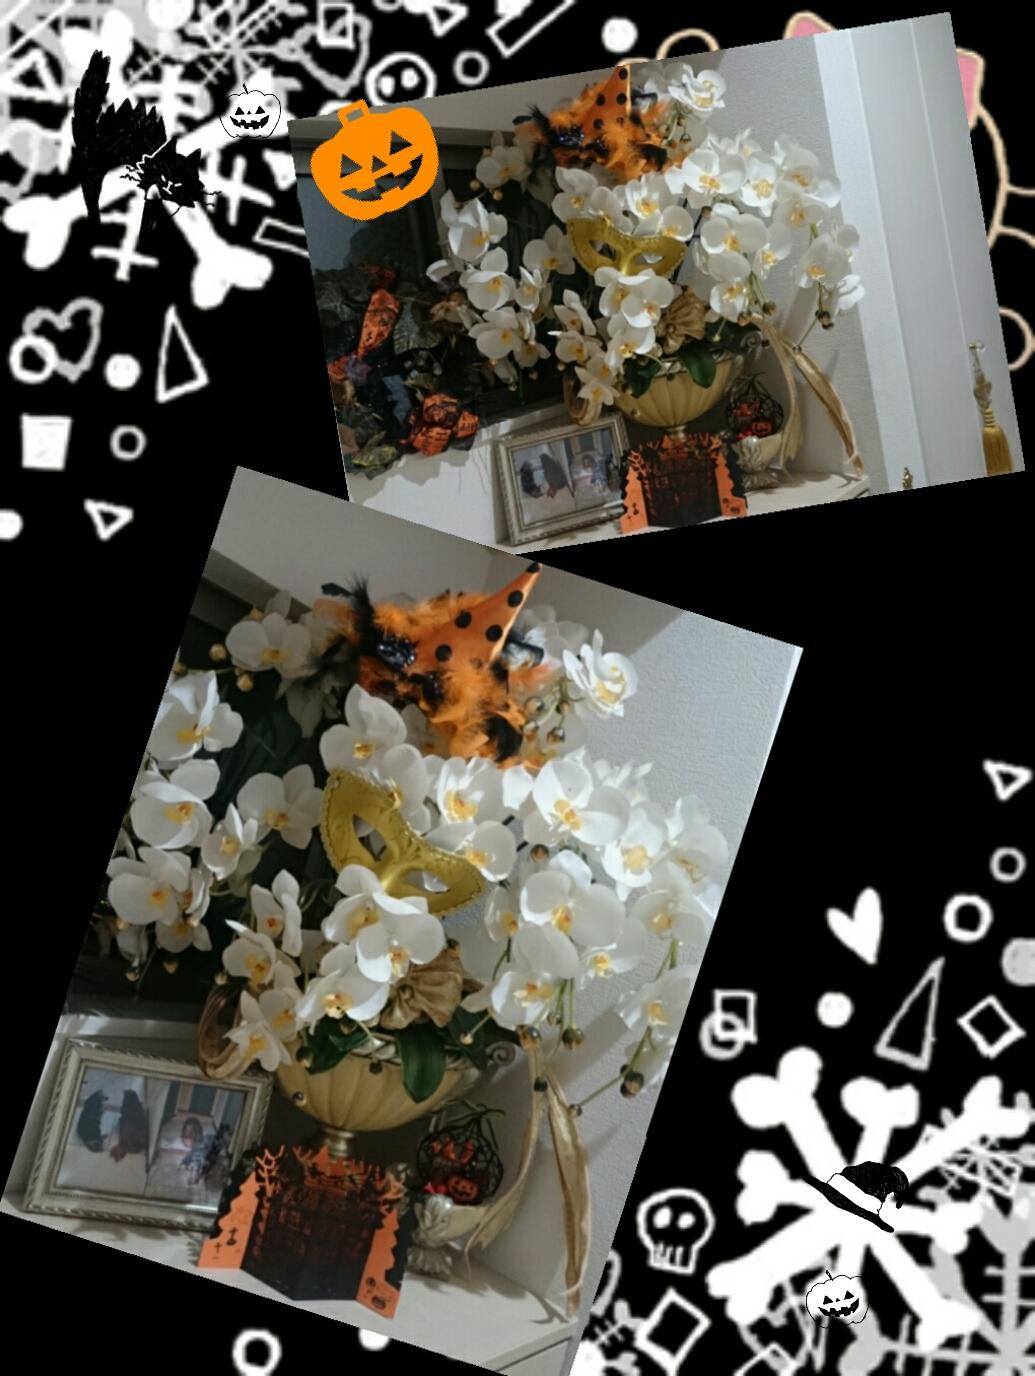 151031_hallo_03.jpg